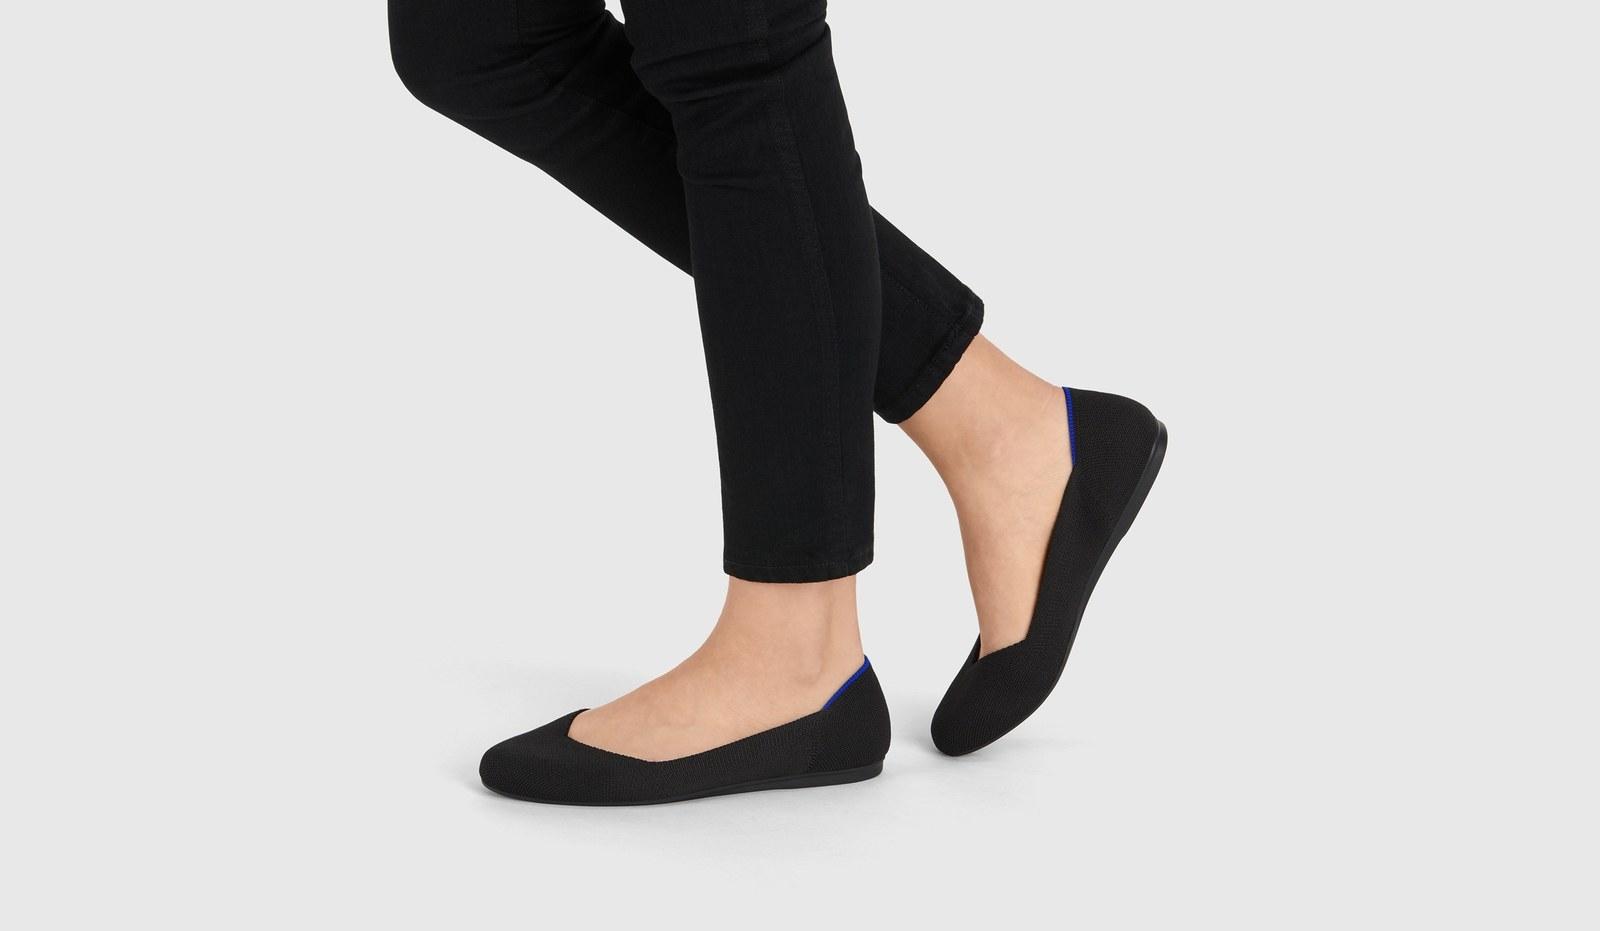 model wearing the flats in black